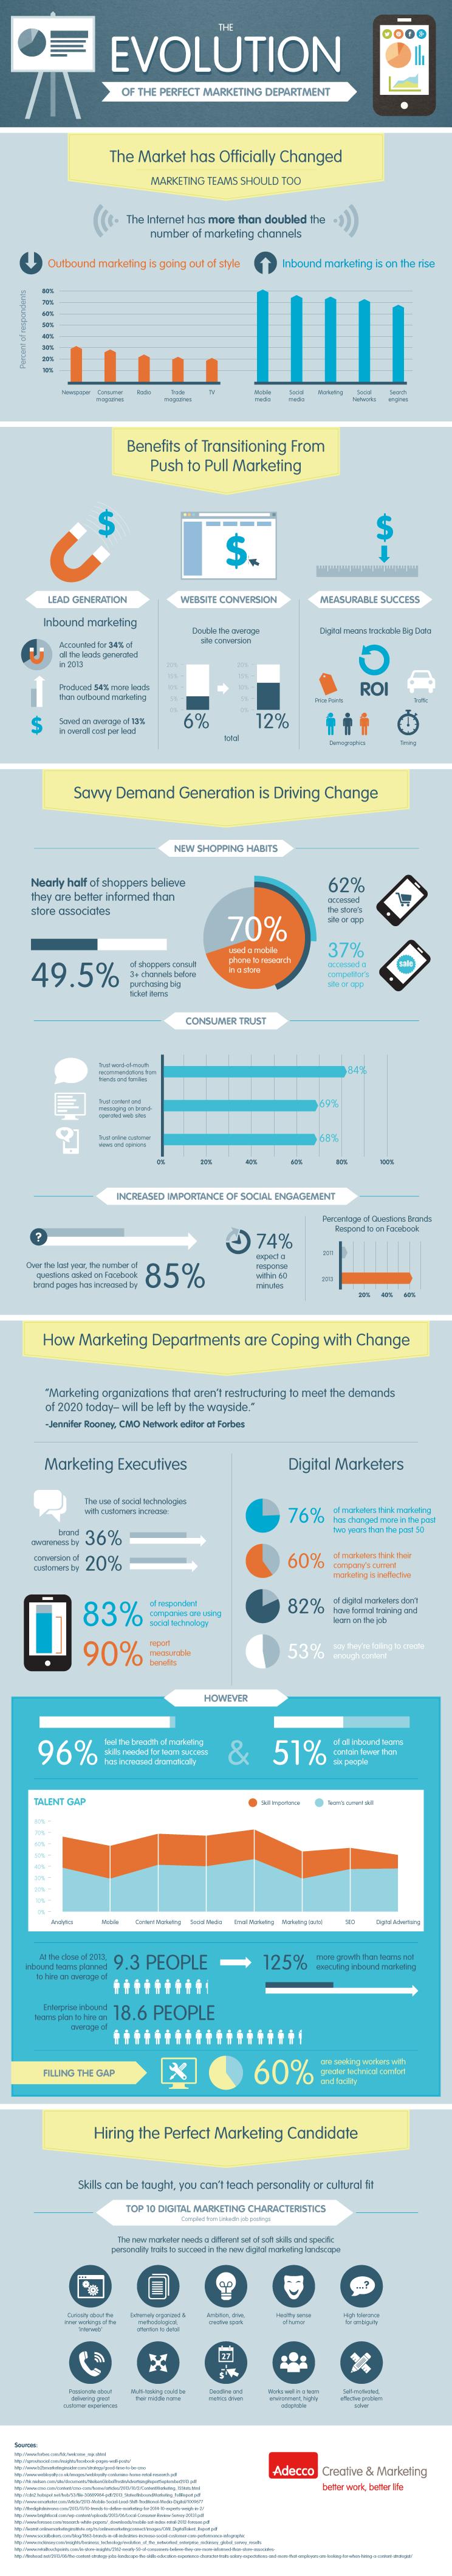 evolution-of-marketing-infographic